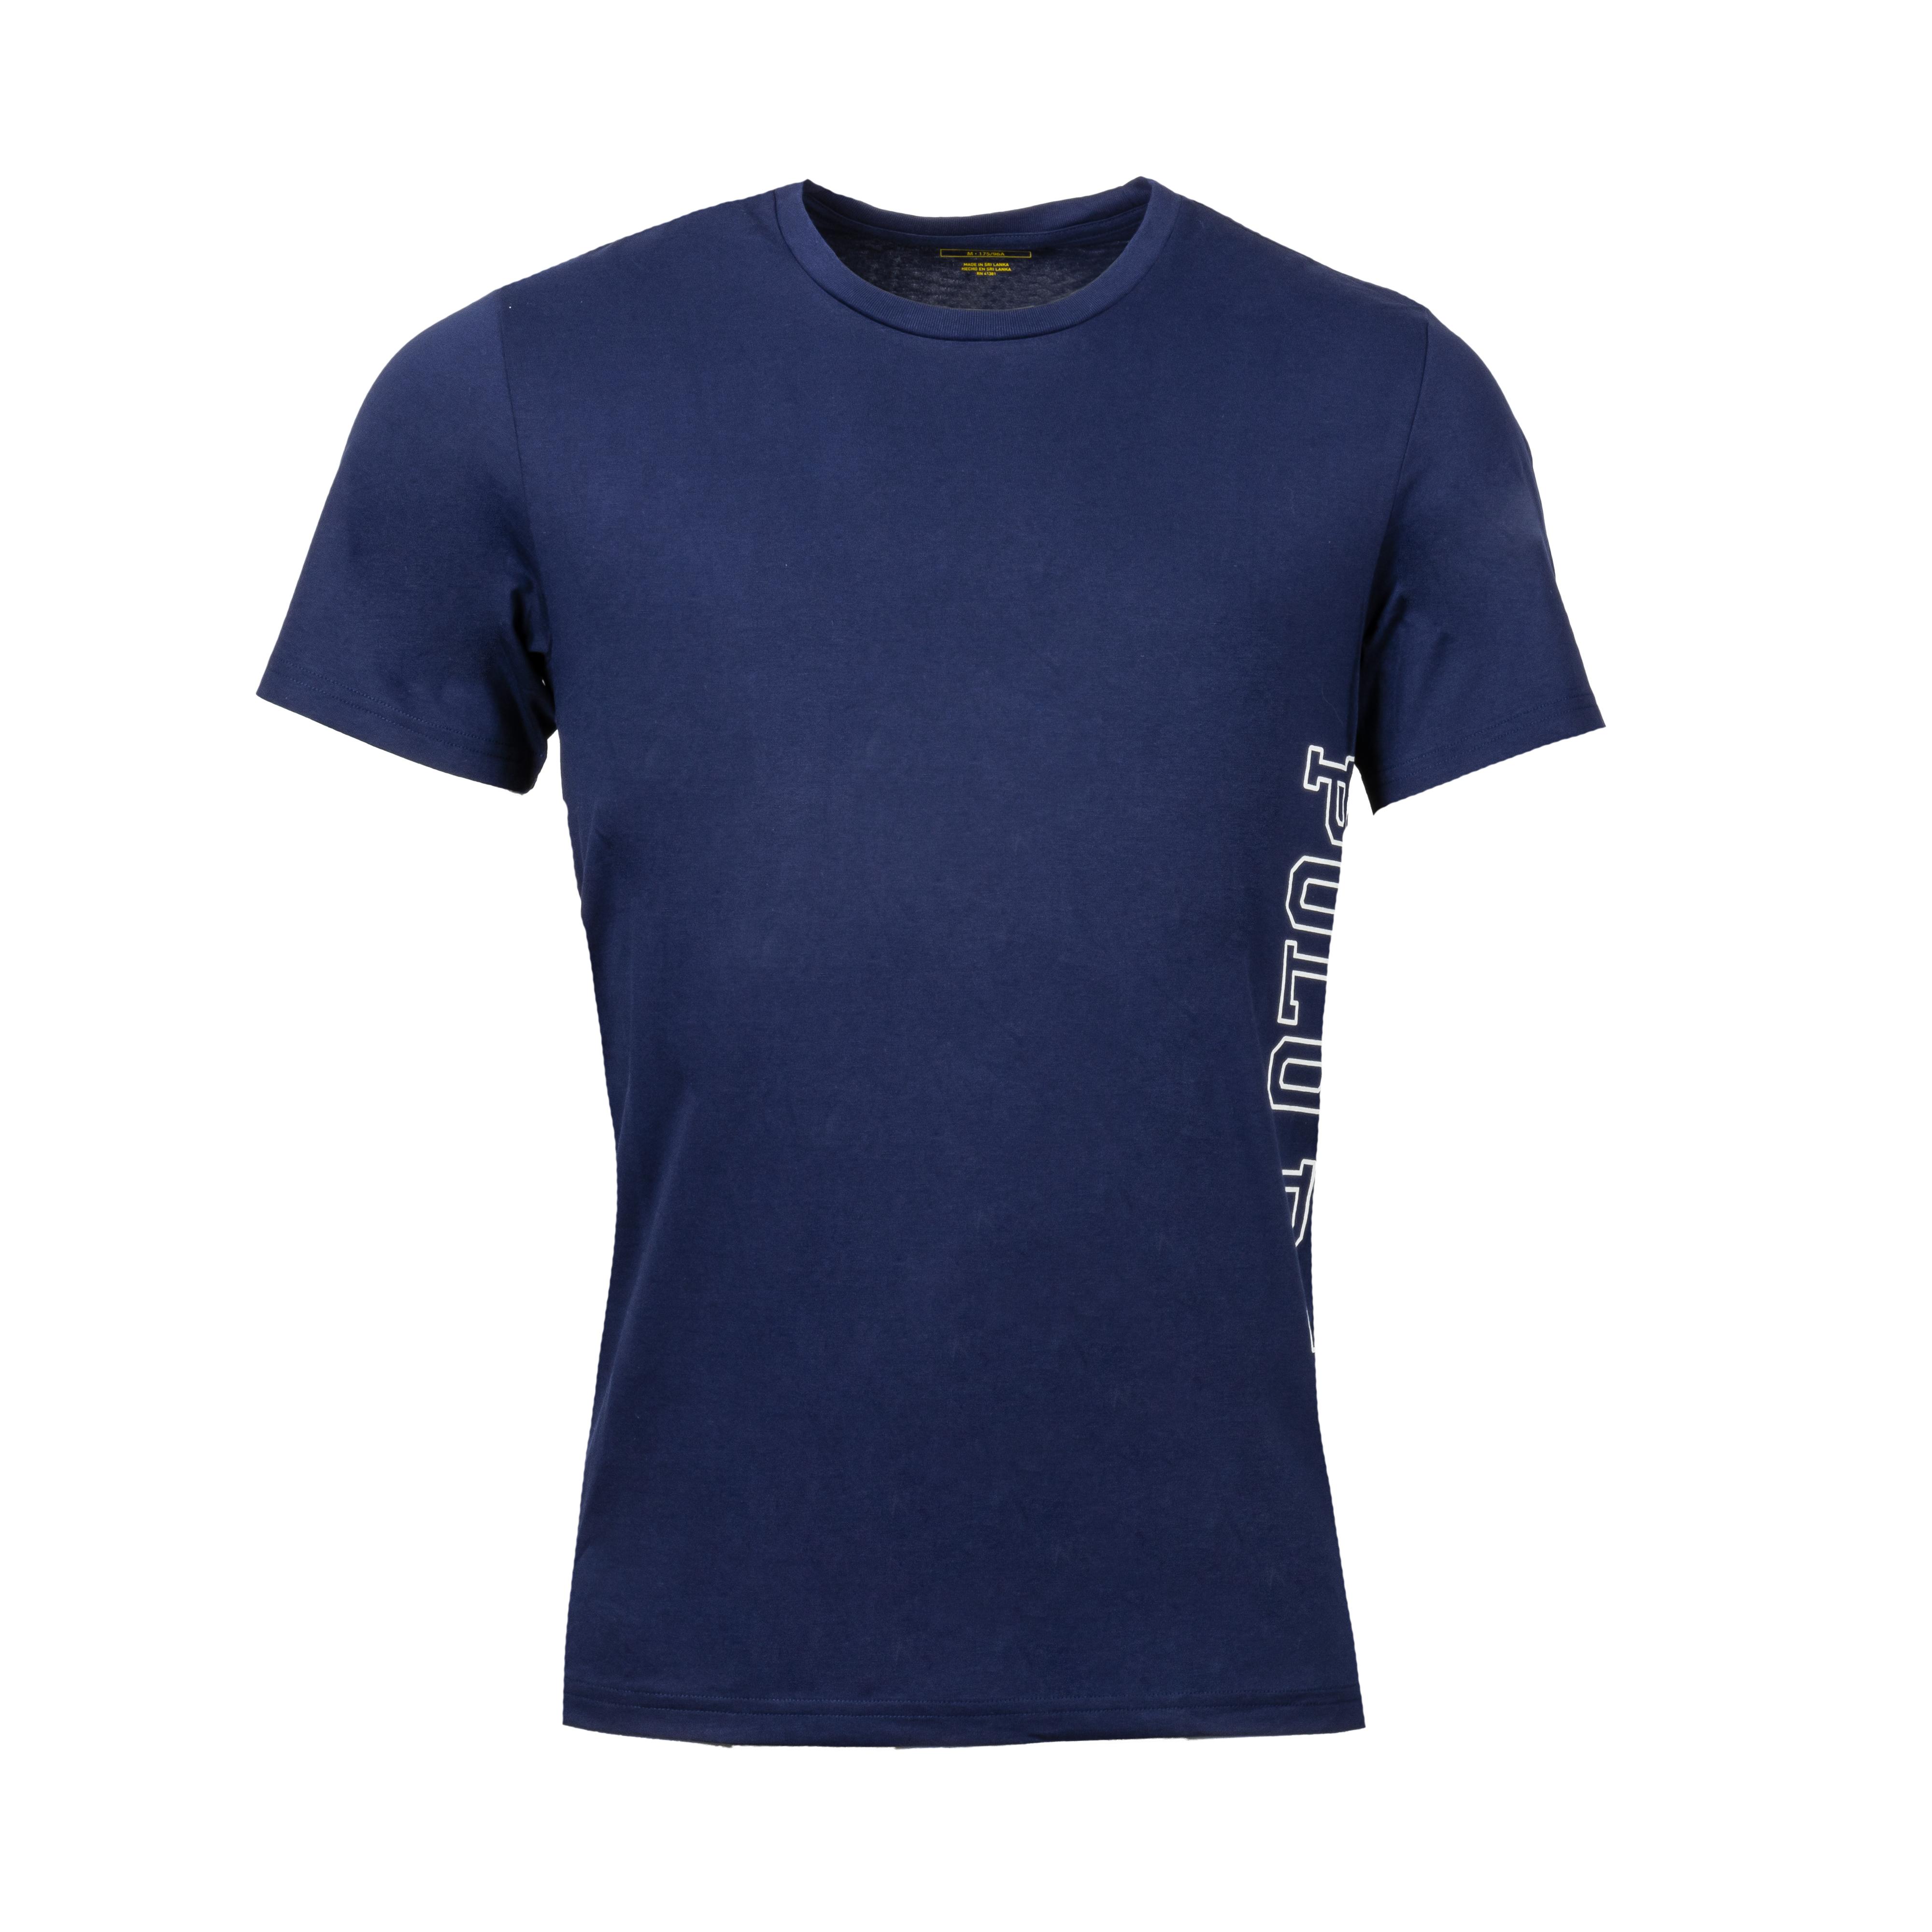 Tee-shirt col rond  en coton bleu marine à logo